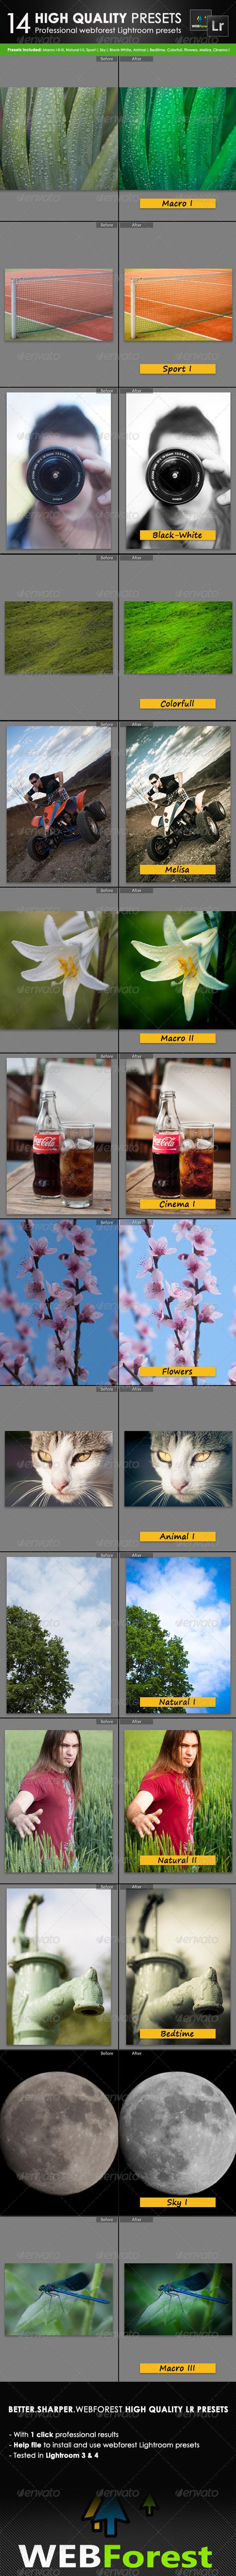 GraphicRiver 14 High Quality Lightroom Presets 5155628